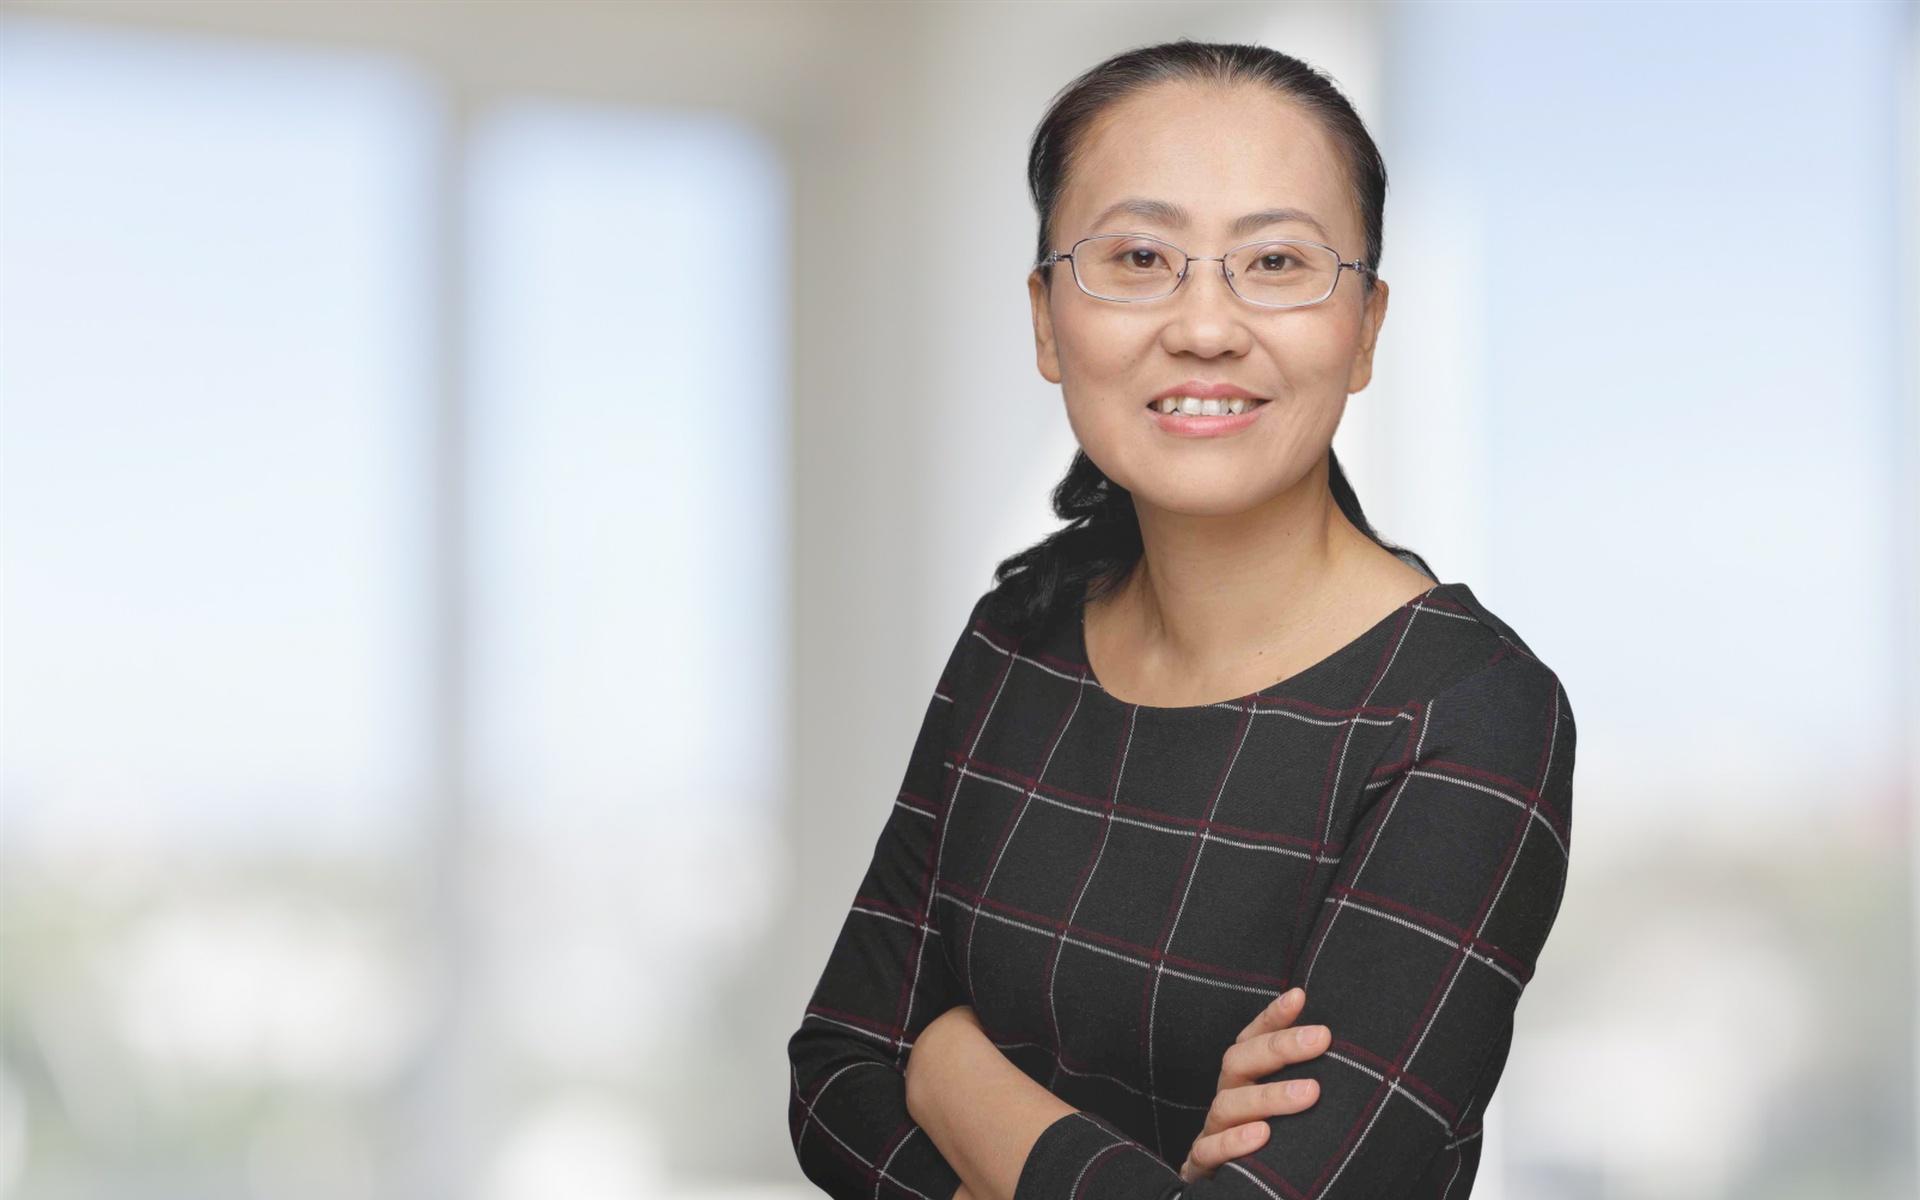 China Markteintritt Expertin - Jing Li